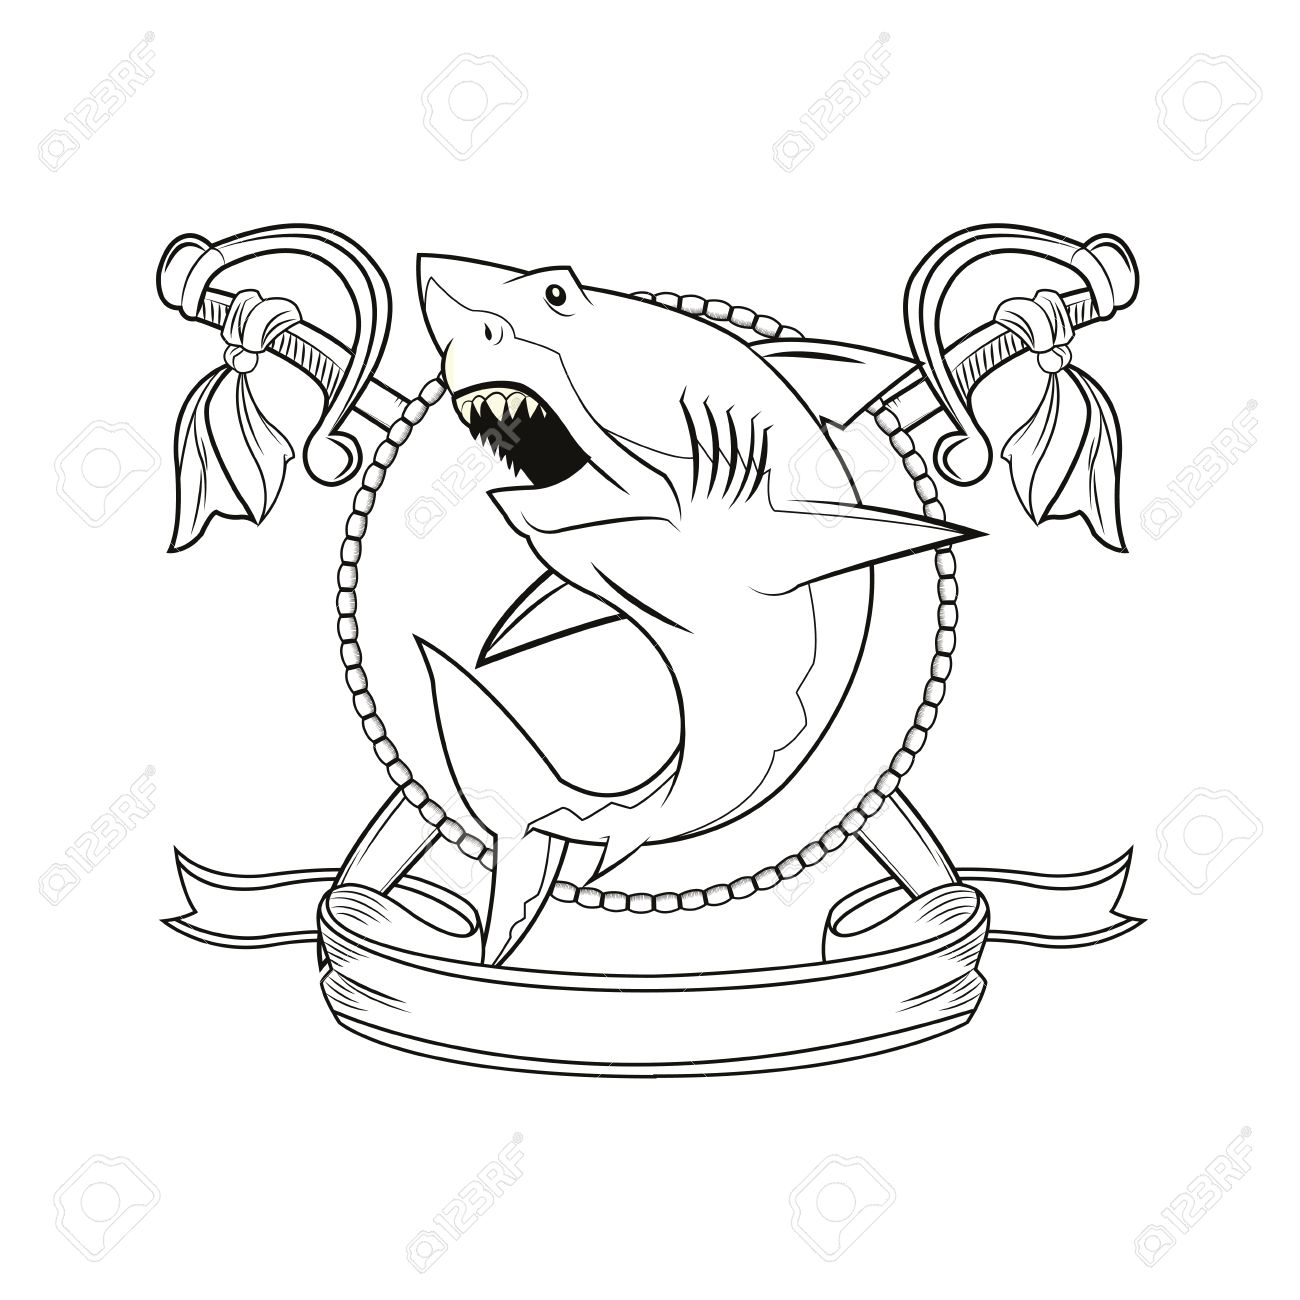 Espada Tiburón De La Historieta De La Cinta Pirata Tatuaje Marina ...